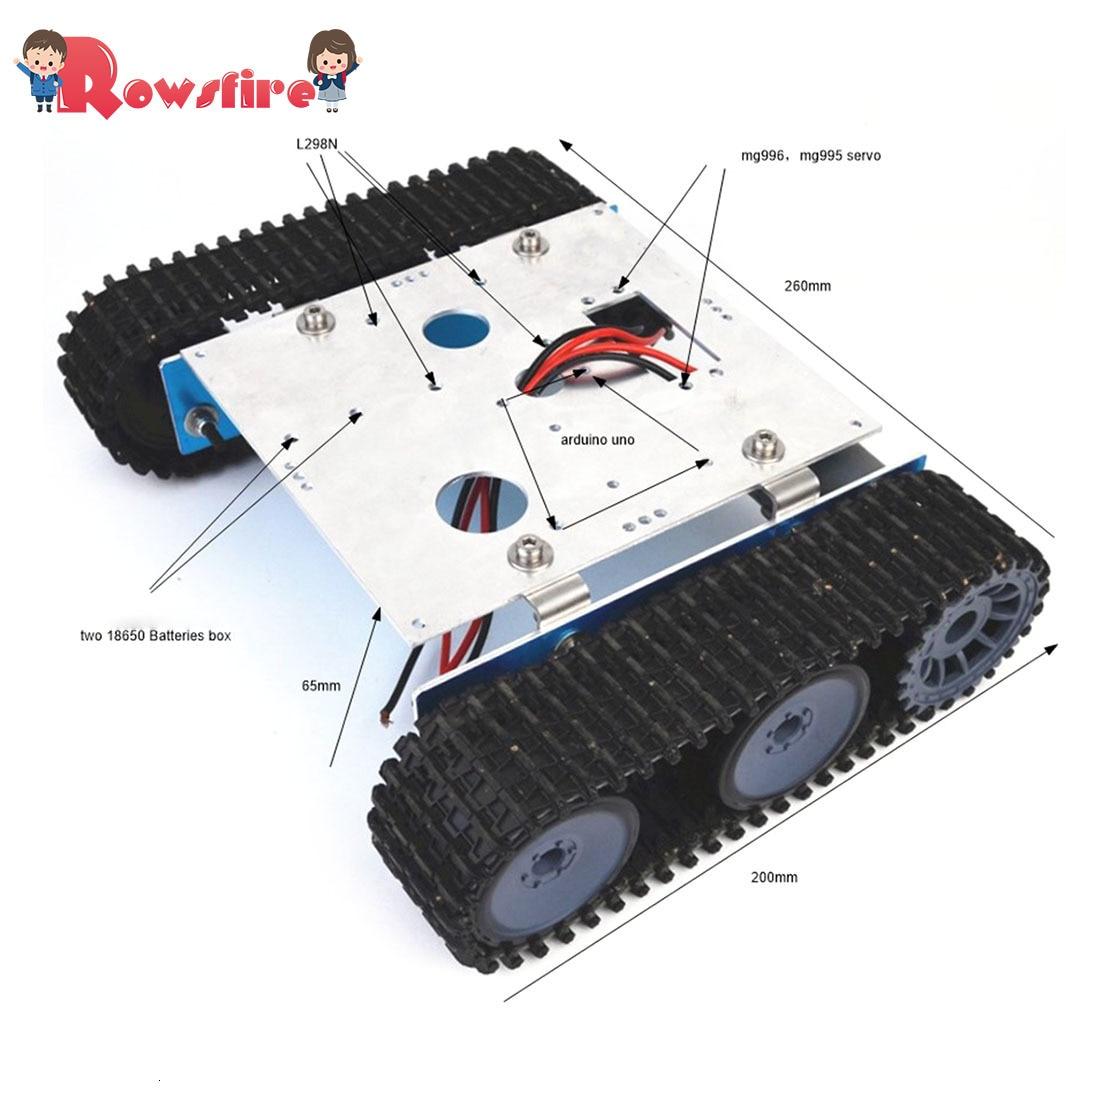 DIY Aluminium Alloy Tank Robot Caterpillar Vehicle Platform Chassis Assembly Kit For Arduino